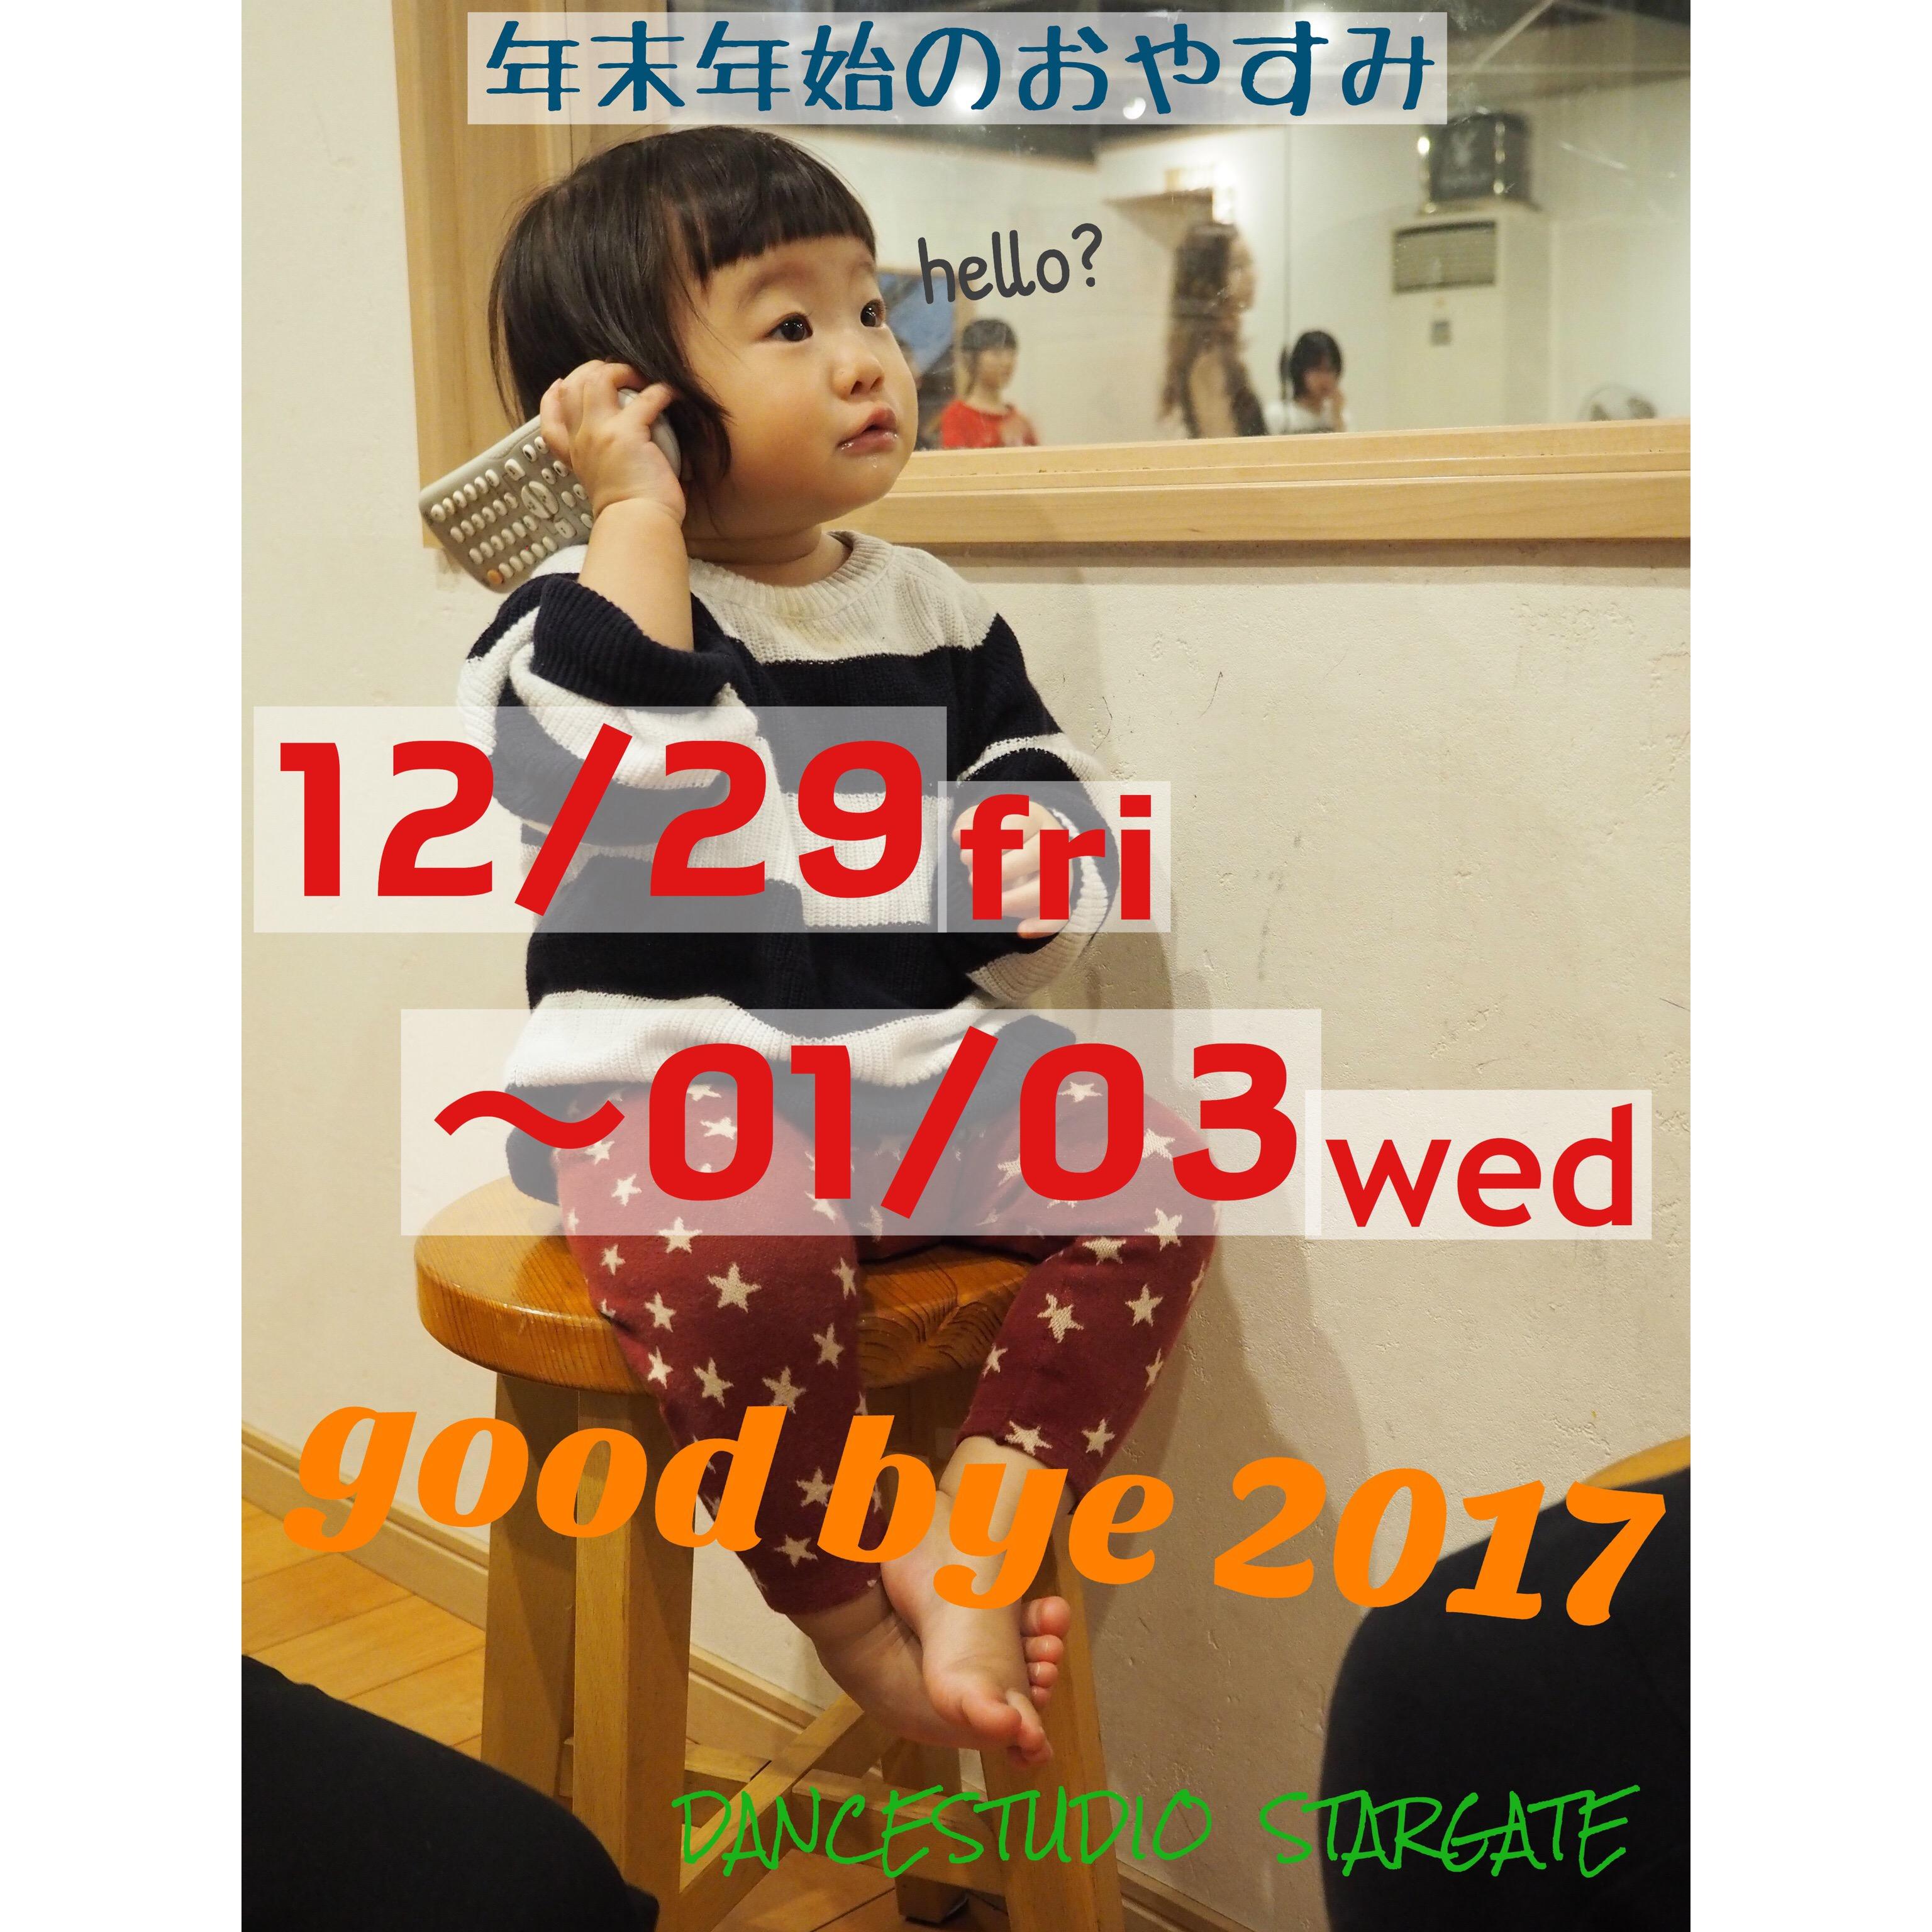 3BE15F11-0CD5-4E65-9B13-03B3B0D9815F